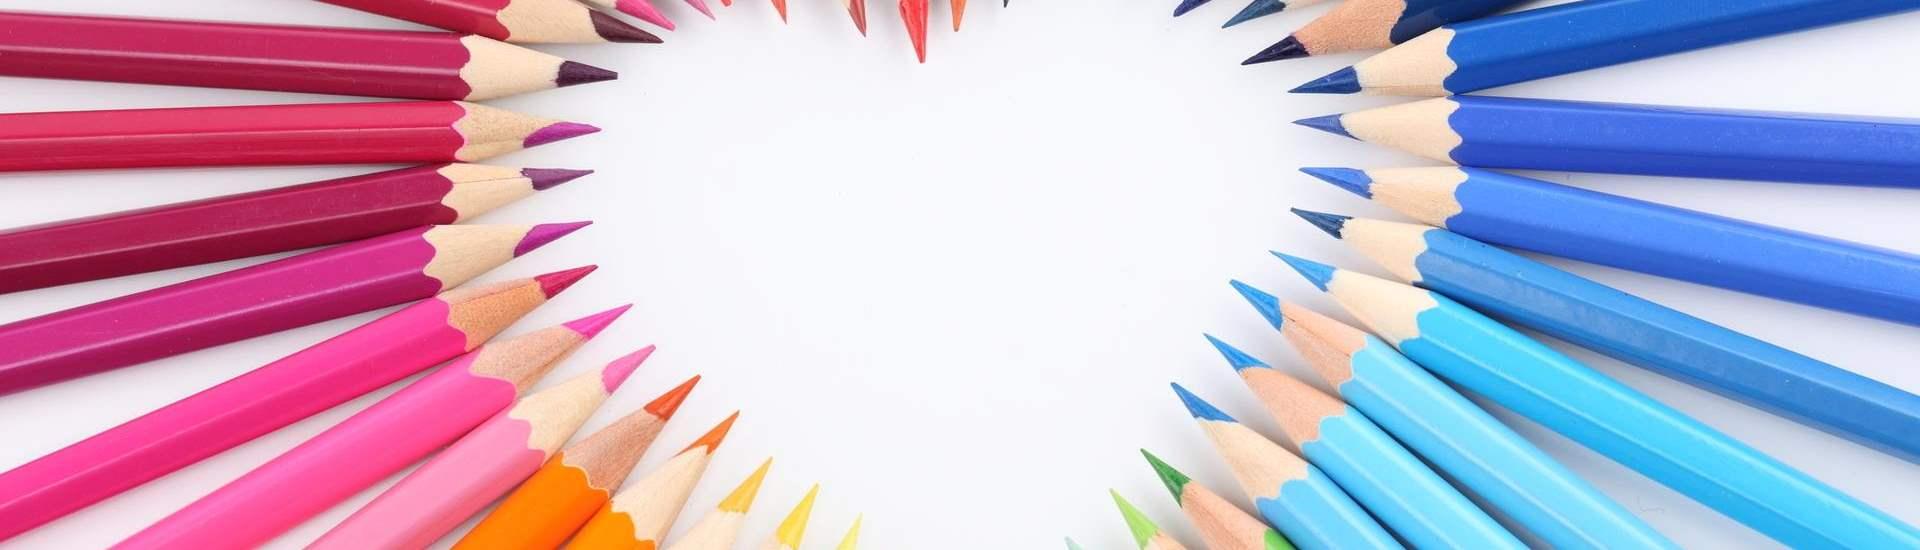 Colored-Pencils-Love-Image-Wallpaper-HD